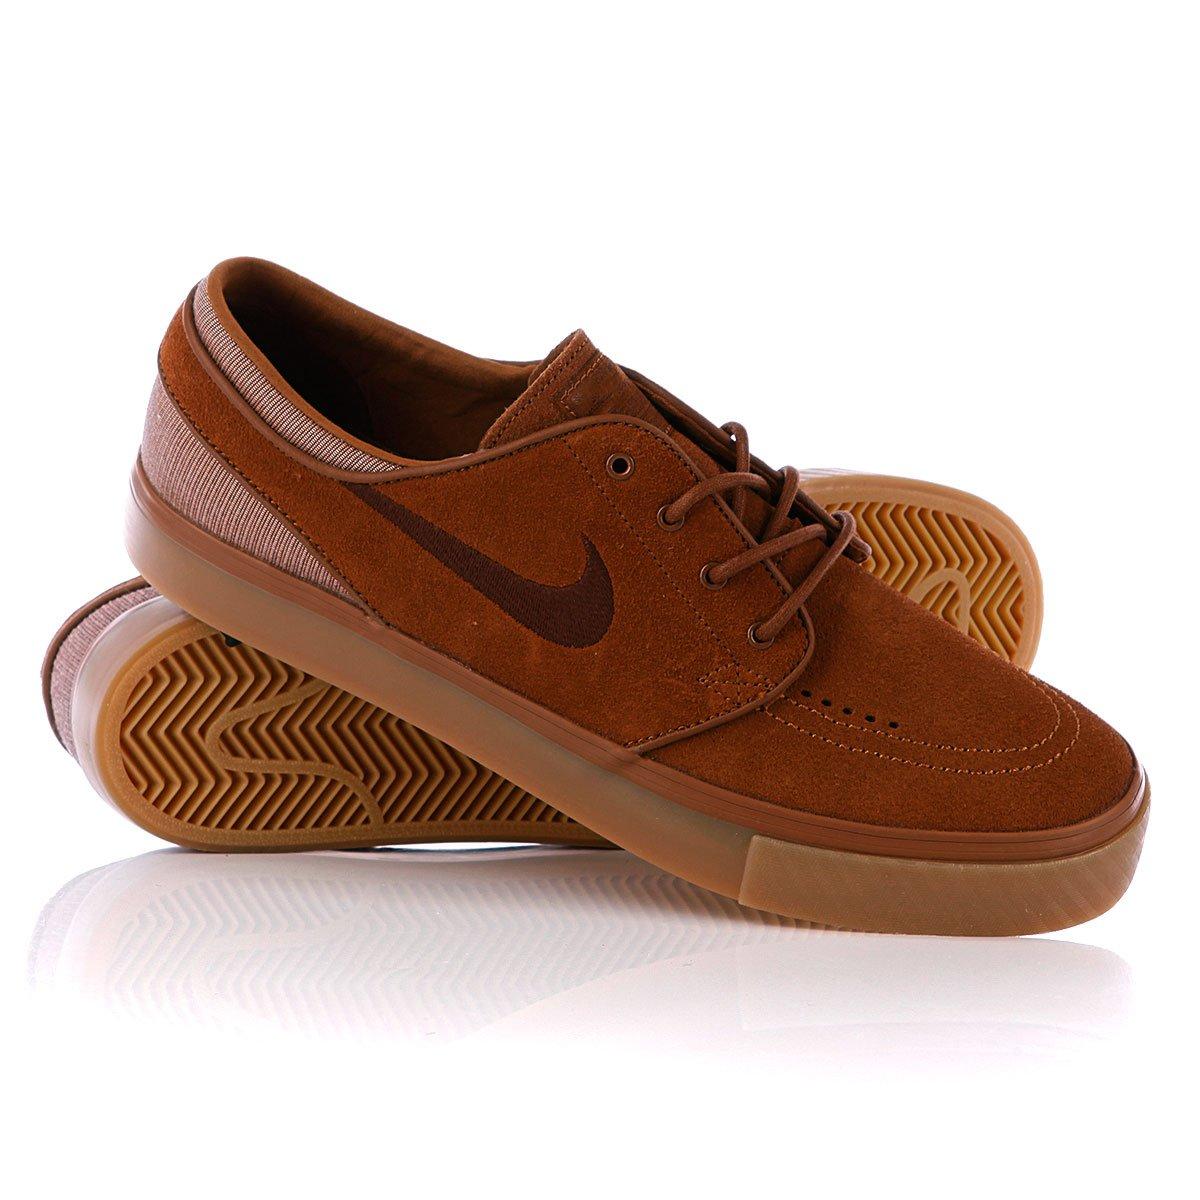 6cddfedd Купить кеды Nike Zoom Stefan Janoski Light British Tan/Dark Field ...